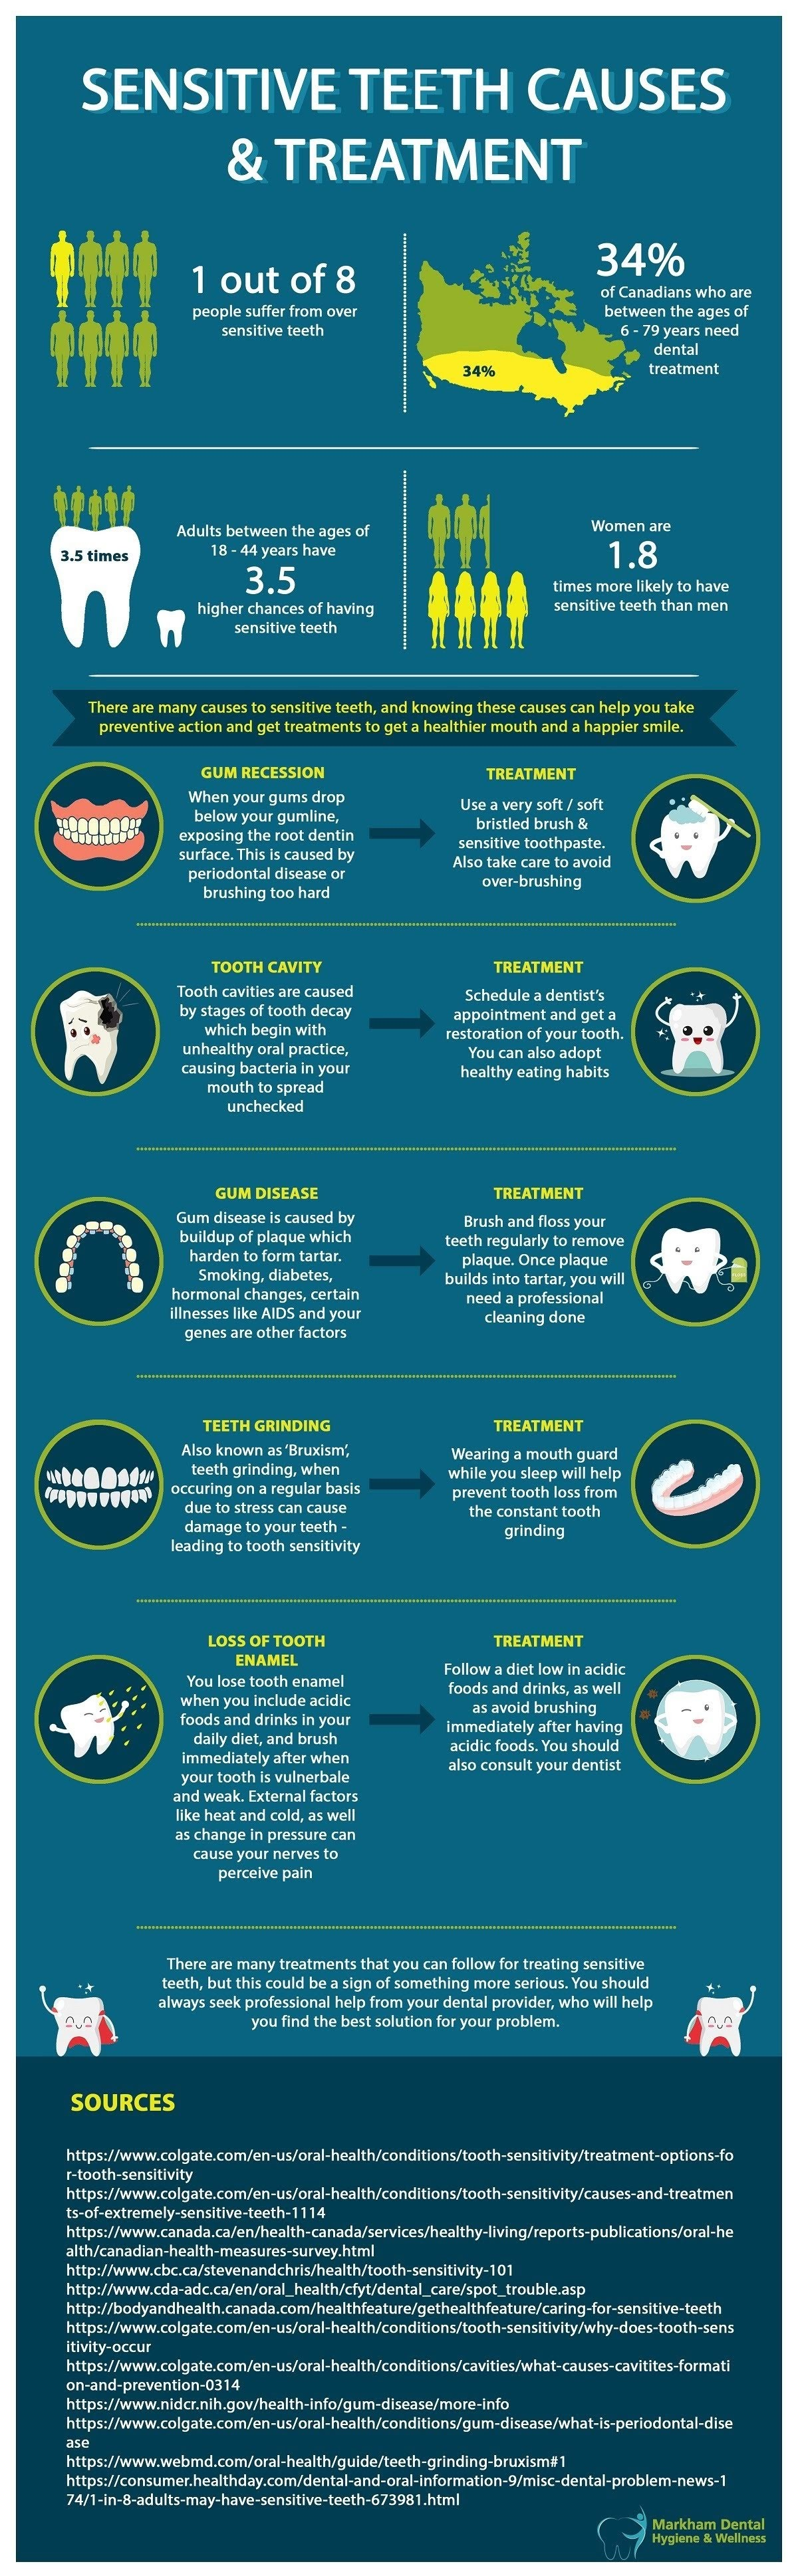 Sensitive Teeth Causes & Treatment #infographic